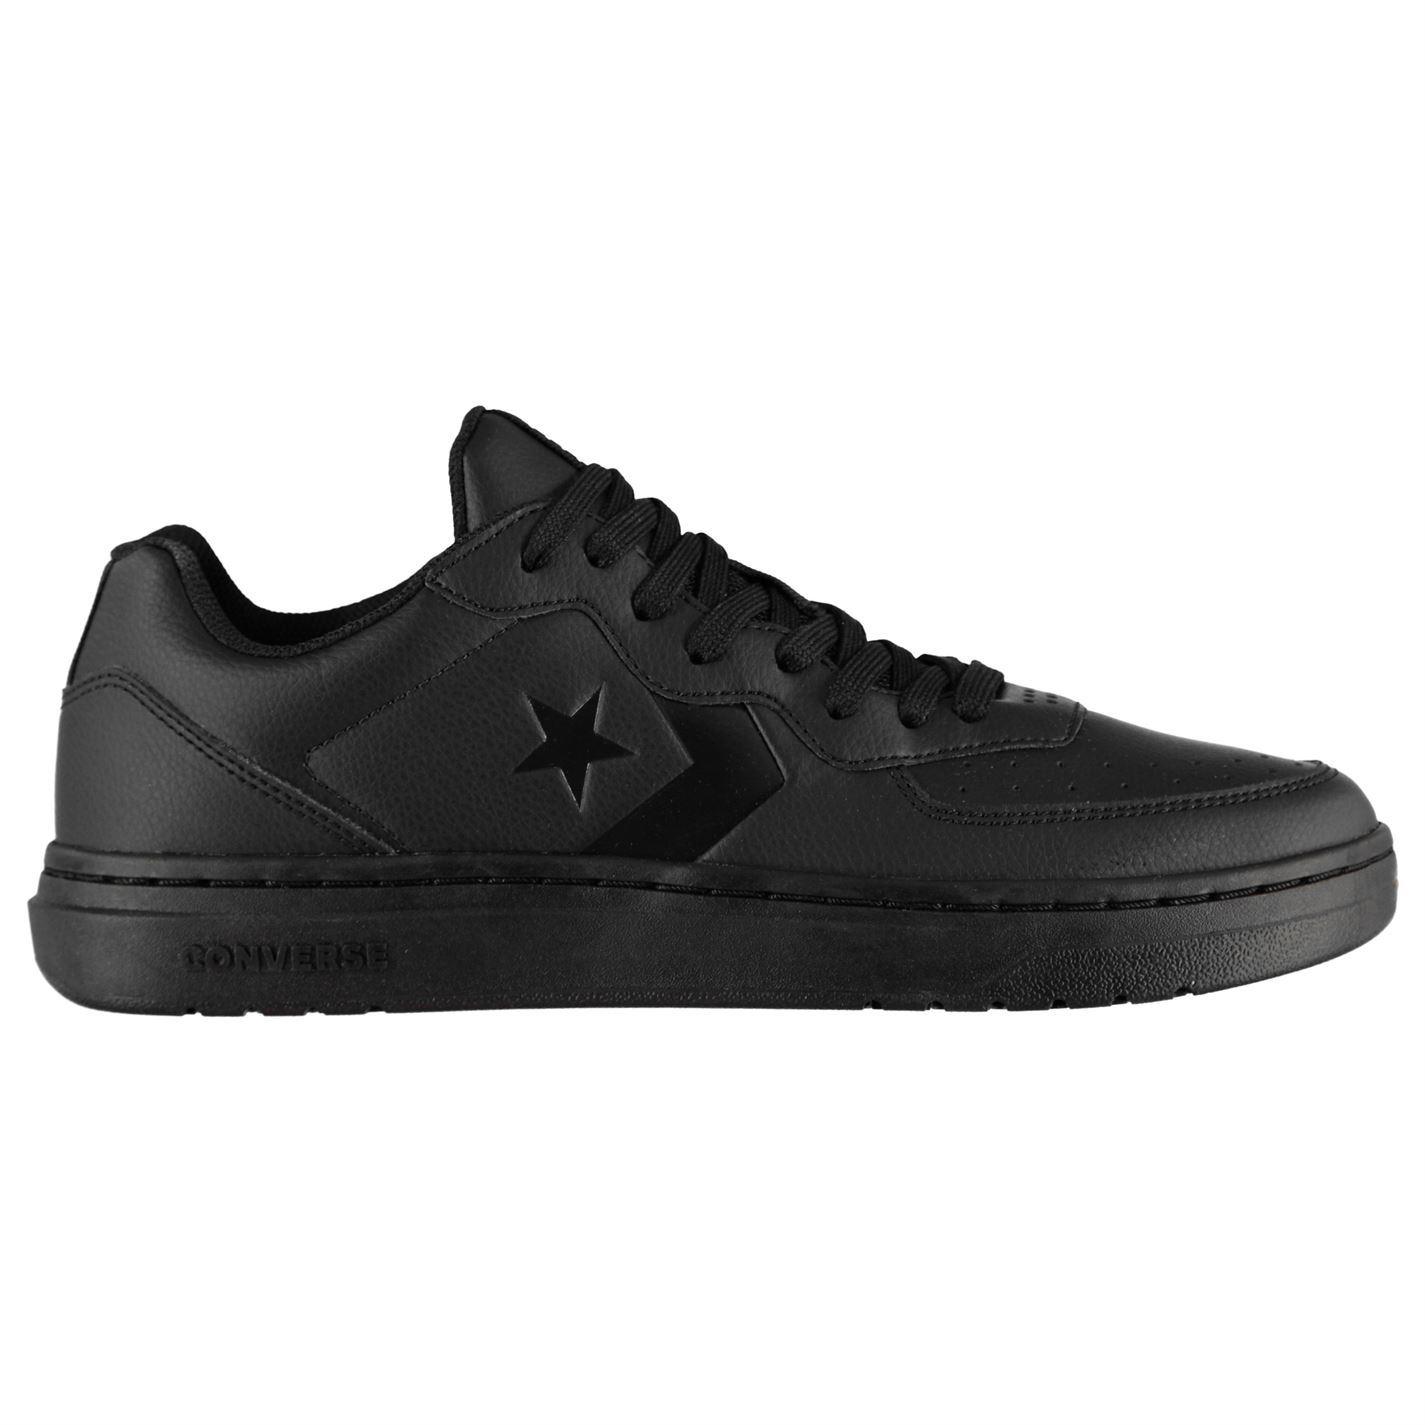 Converse-Ox-Rival-Cuir-Baskets-Pour-Homme-Chaussures-De-Loisirs-Chaussures-Baskets miniature 6